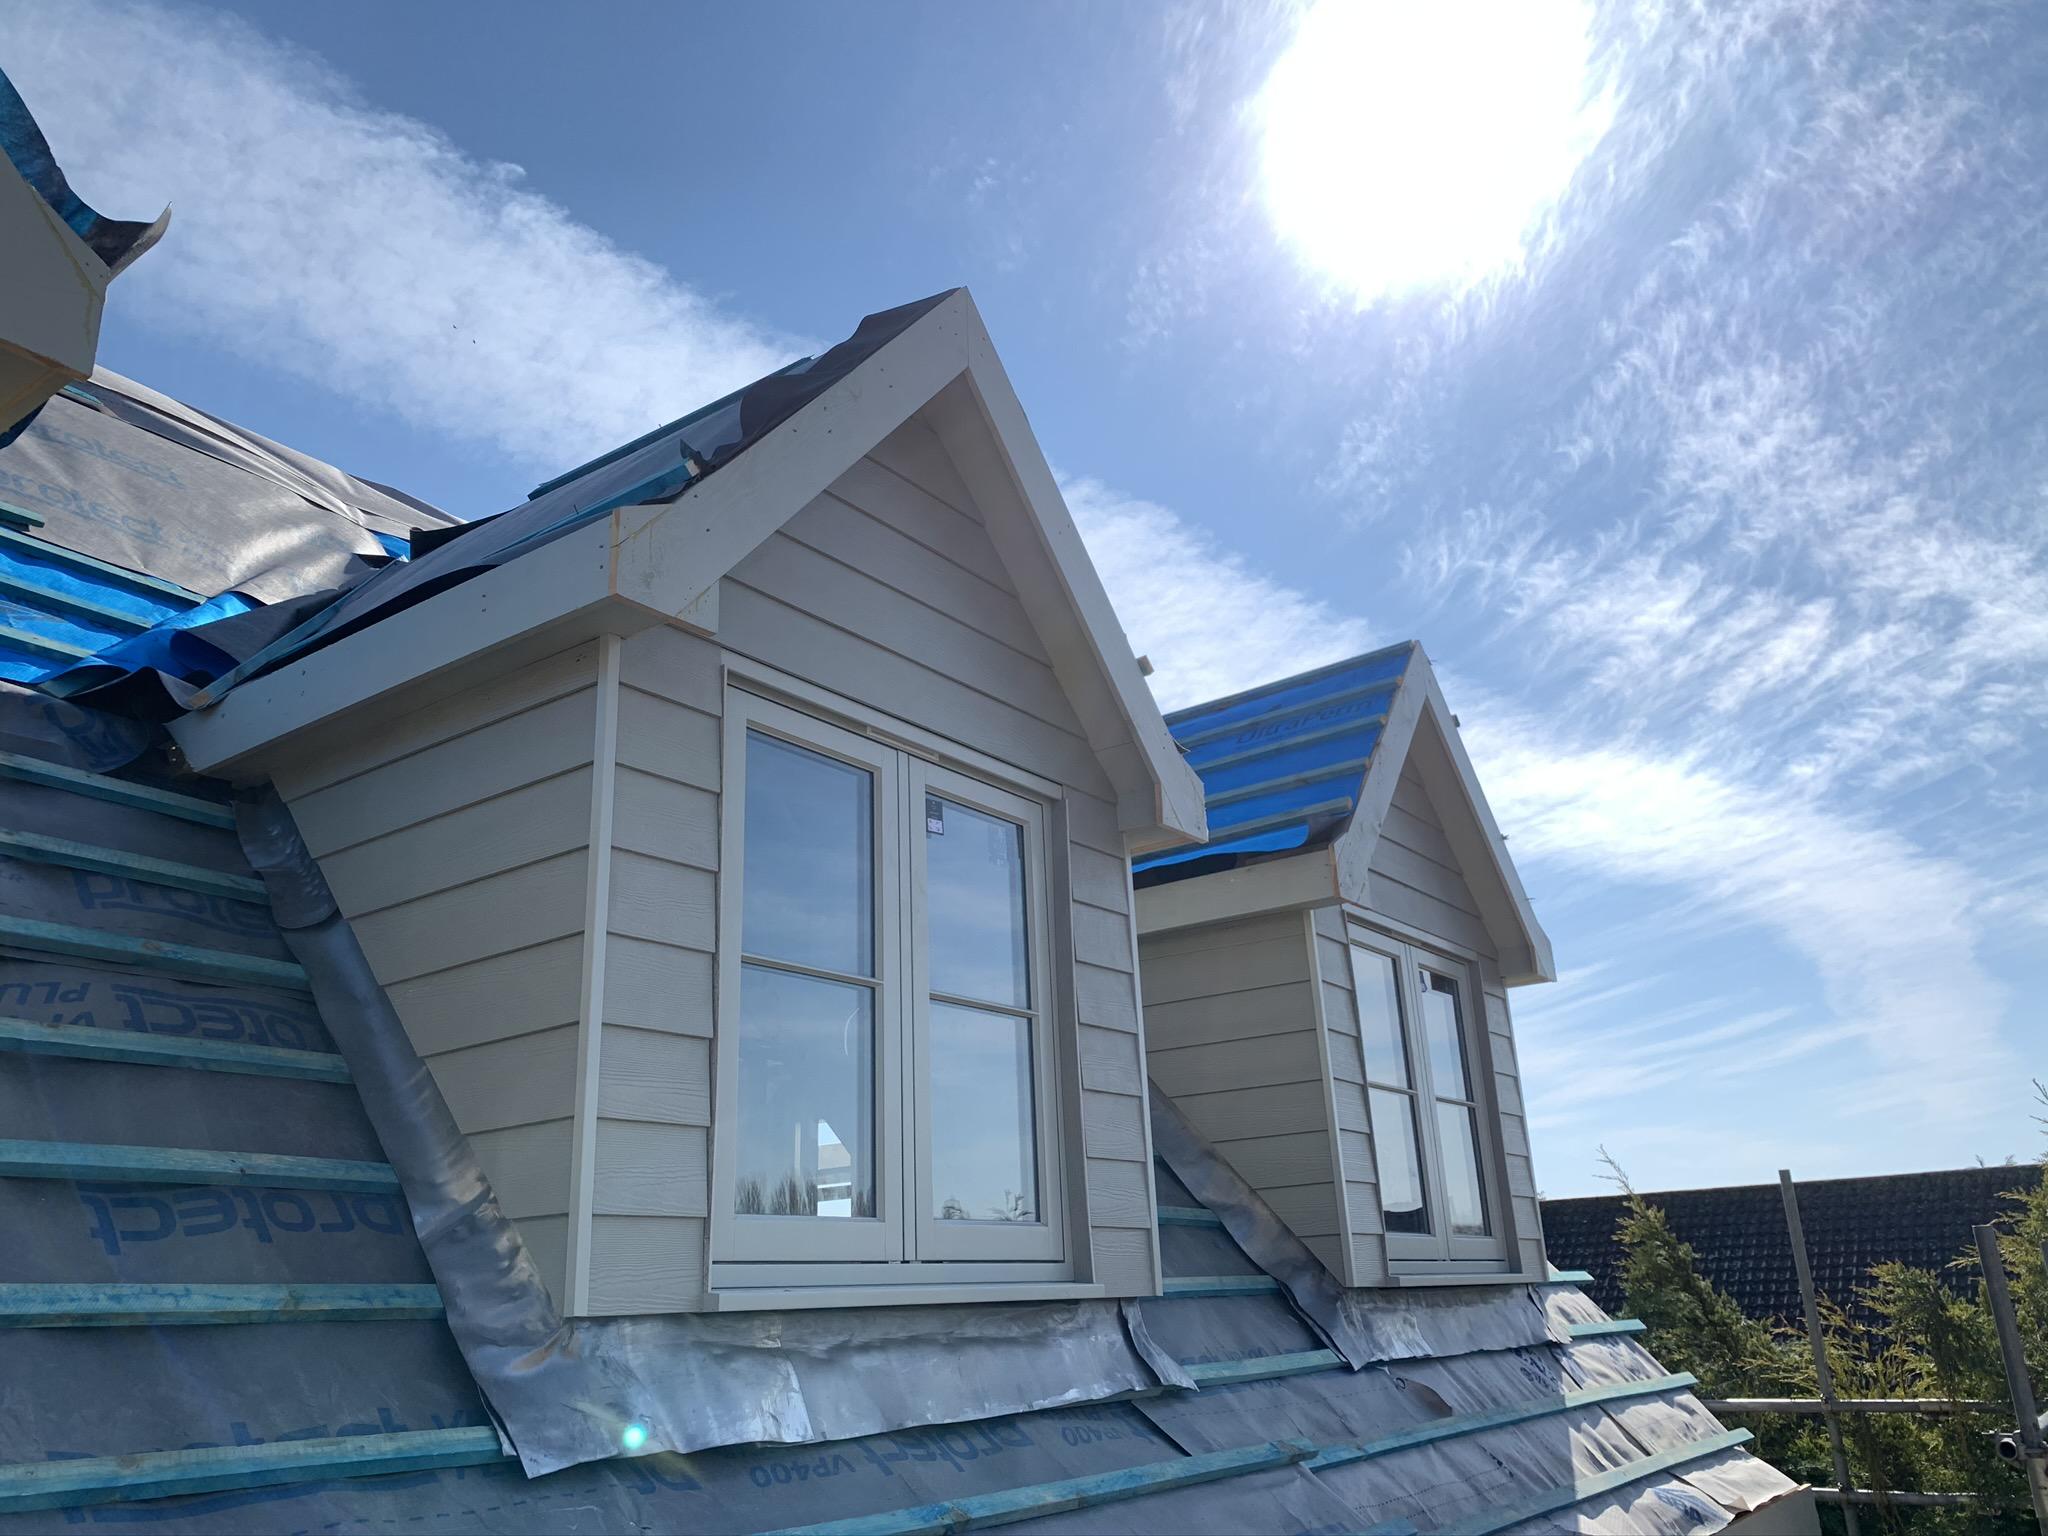 Detached new build in Beyton, Suffolk